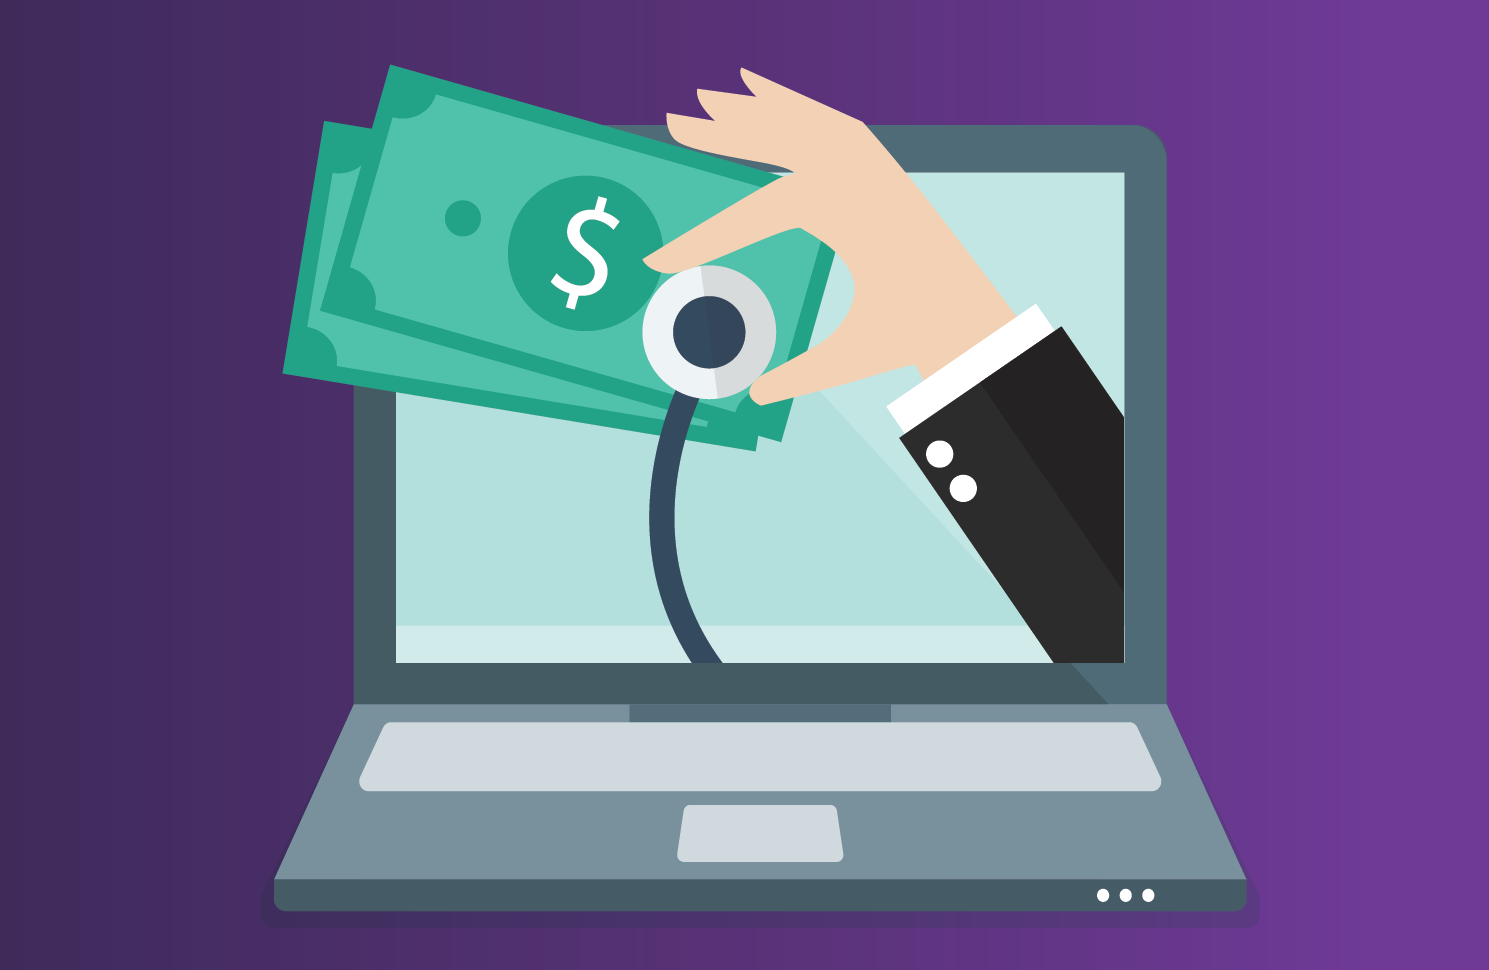 vendor financial statement analysis